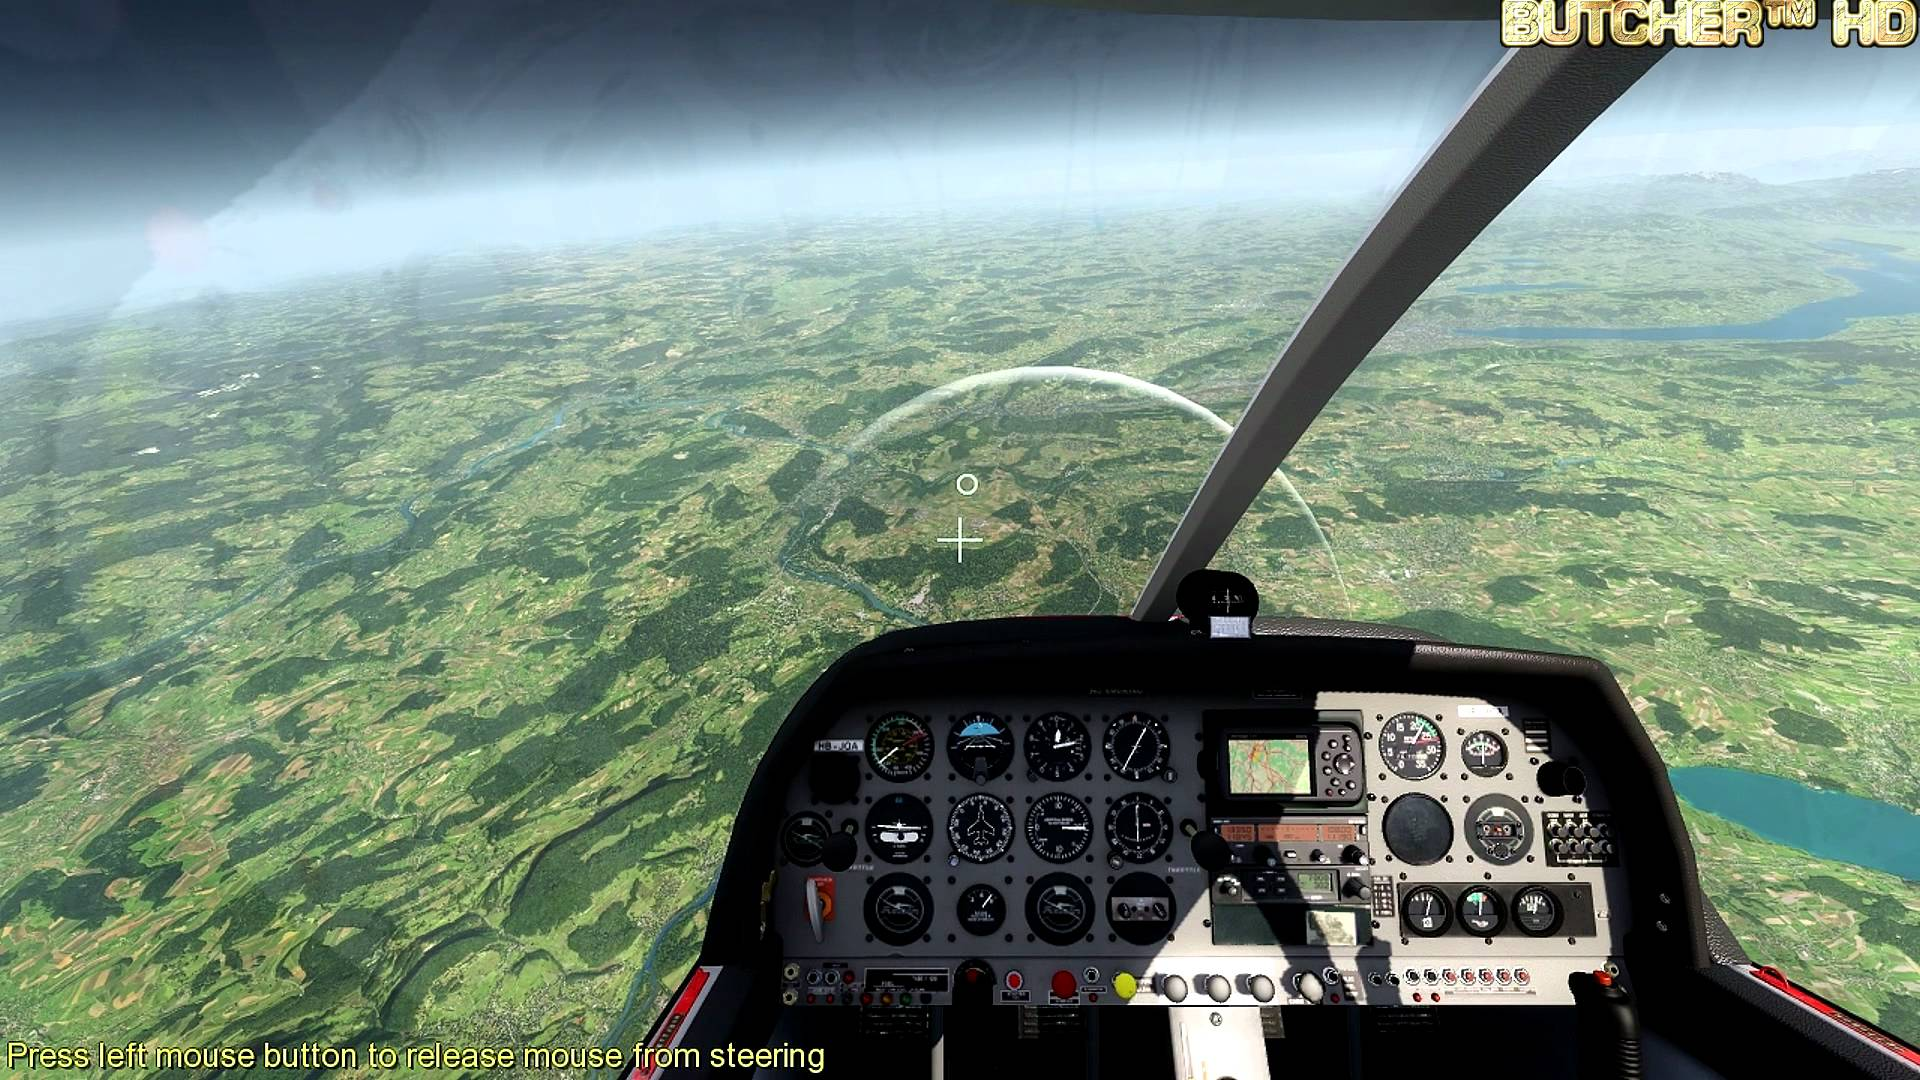 Aerofly Fs #20